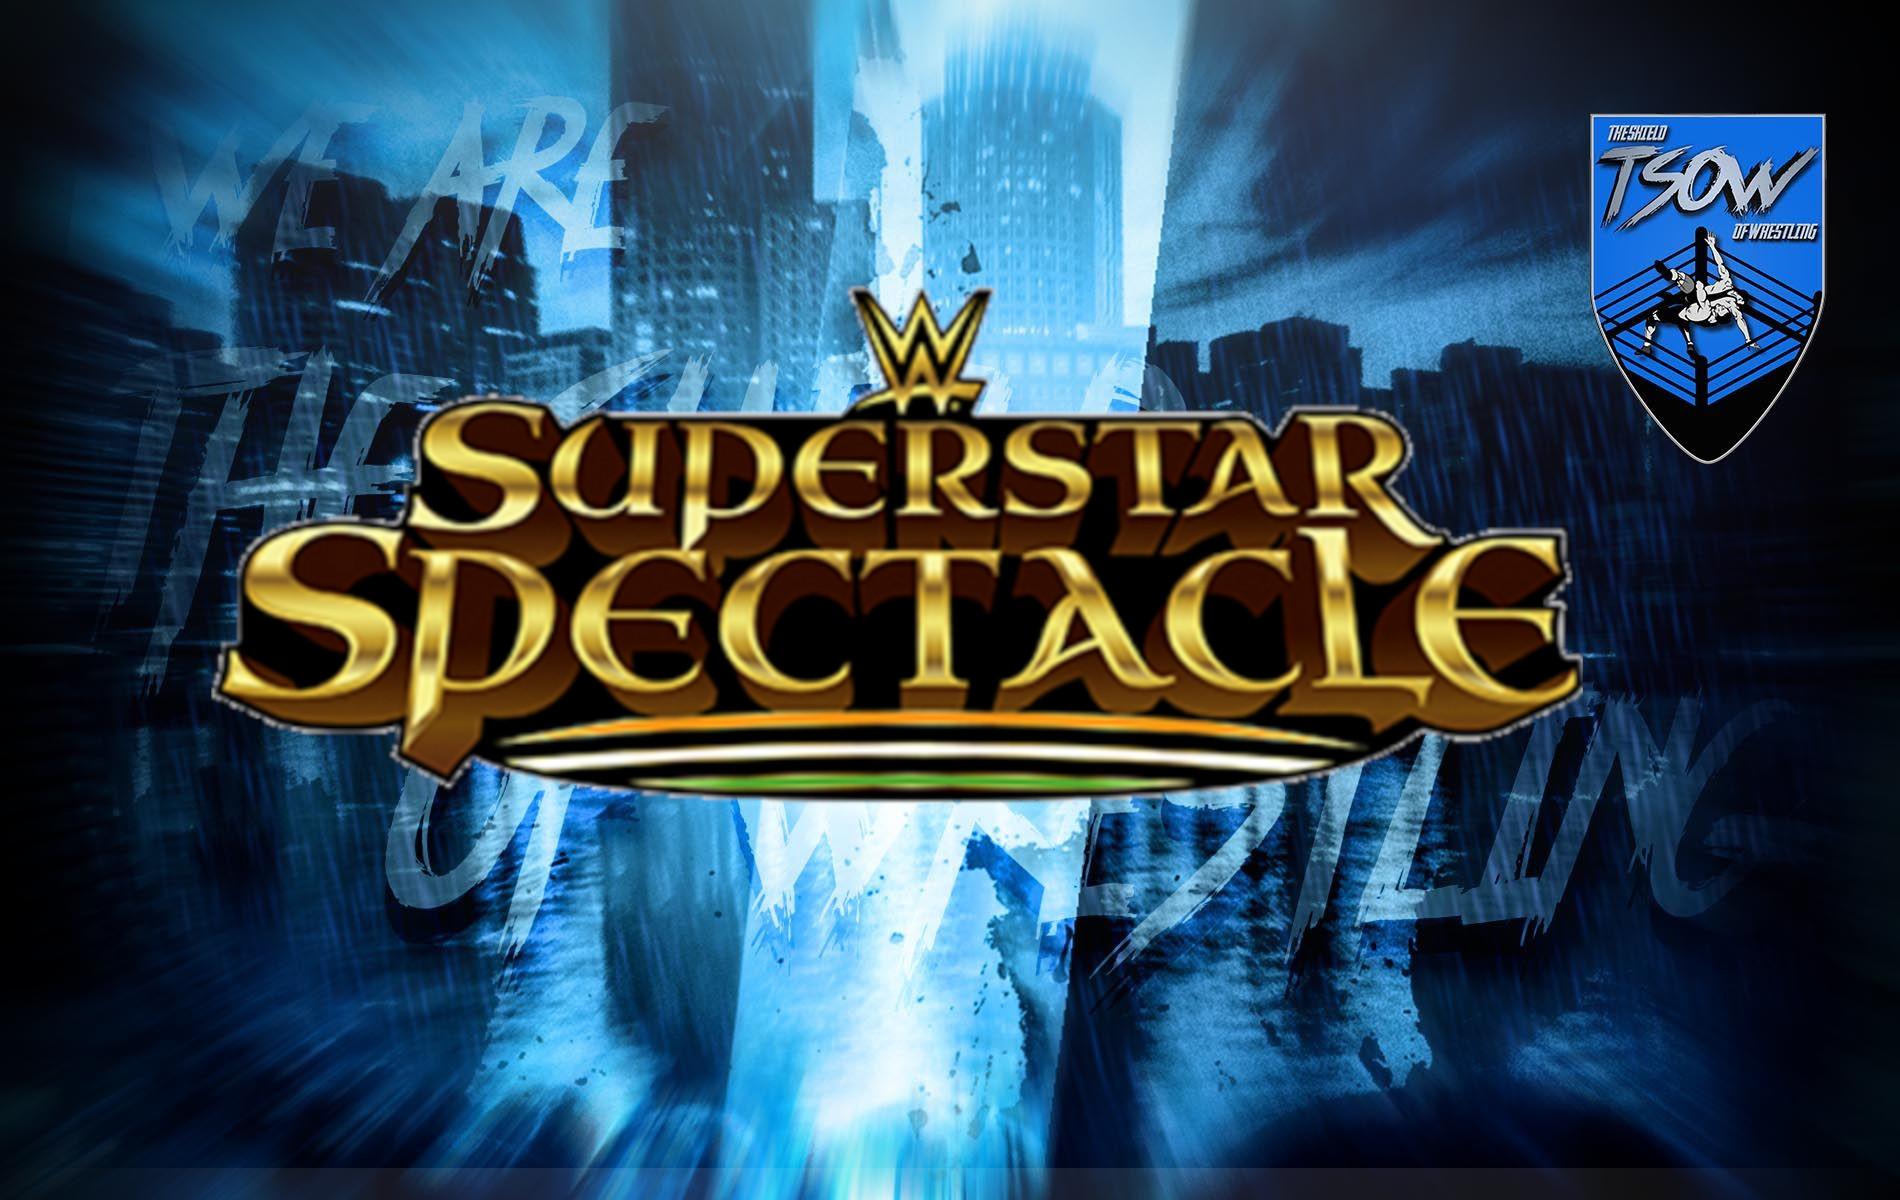 Superstar Spectacle: molte Top Star della WWE confermate